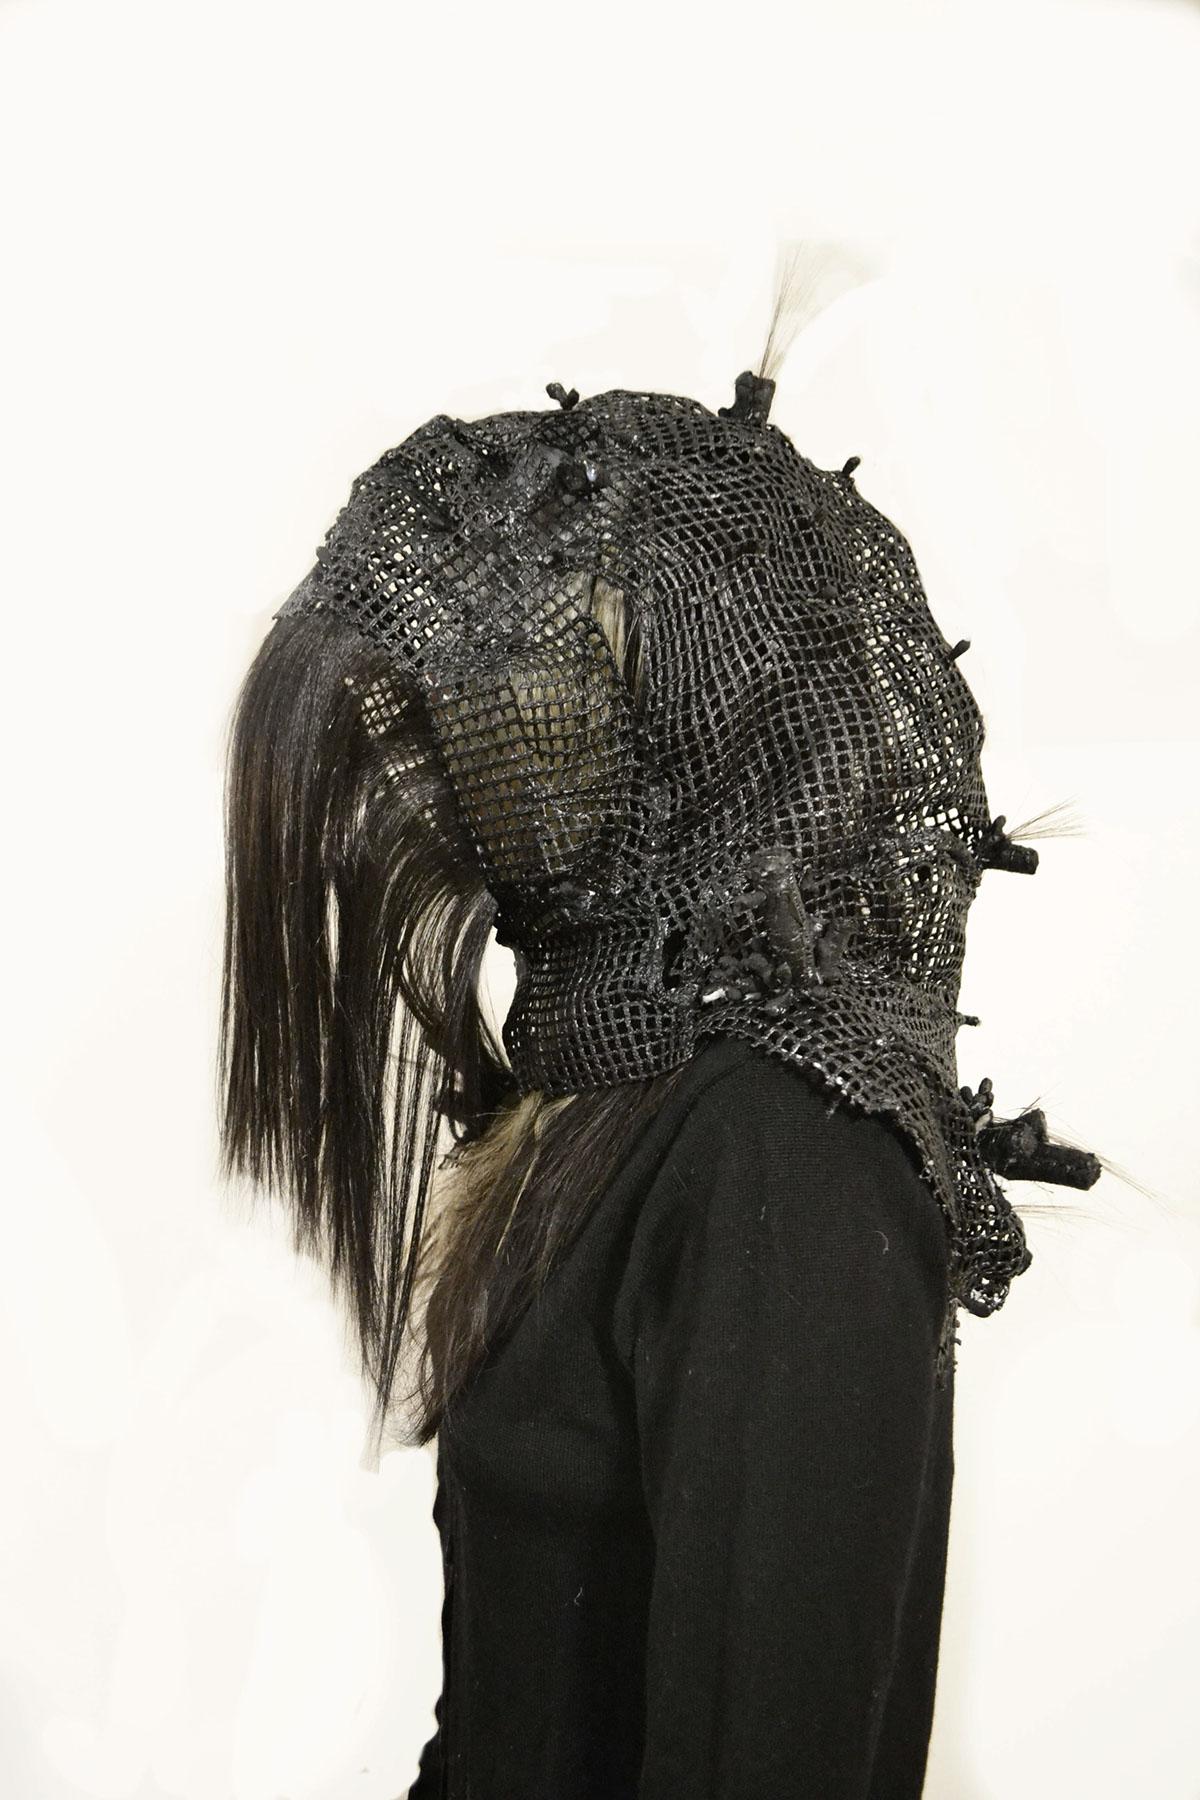 sculptor headwear varaform dark misunderstood creature costume identity human hidden